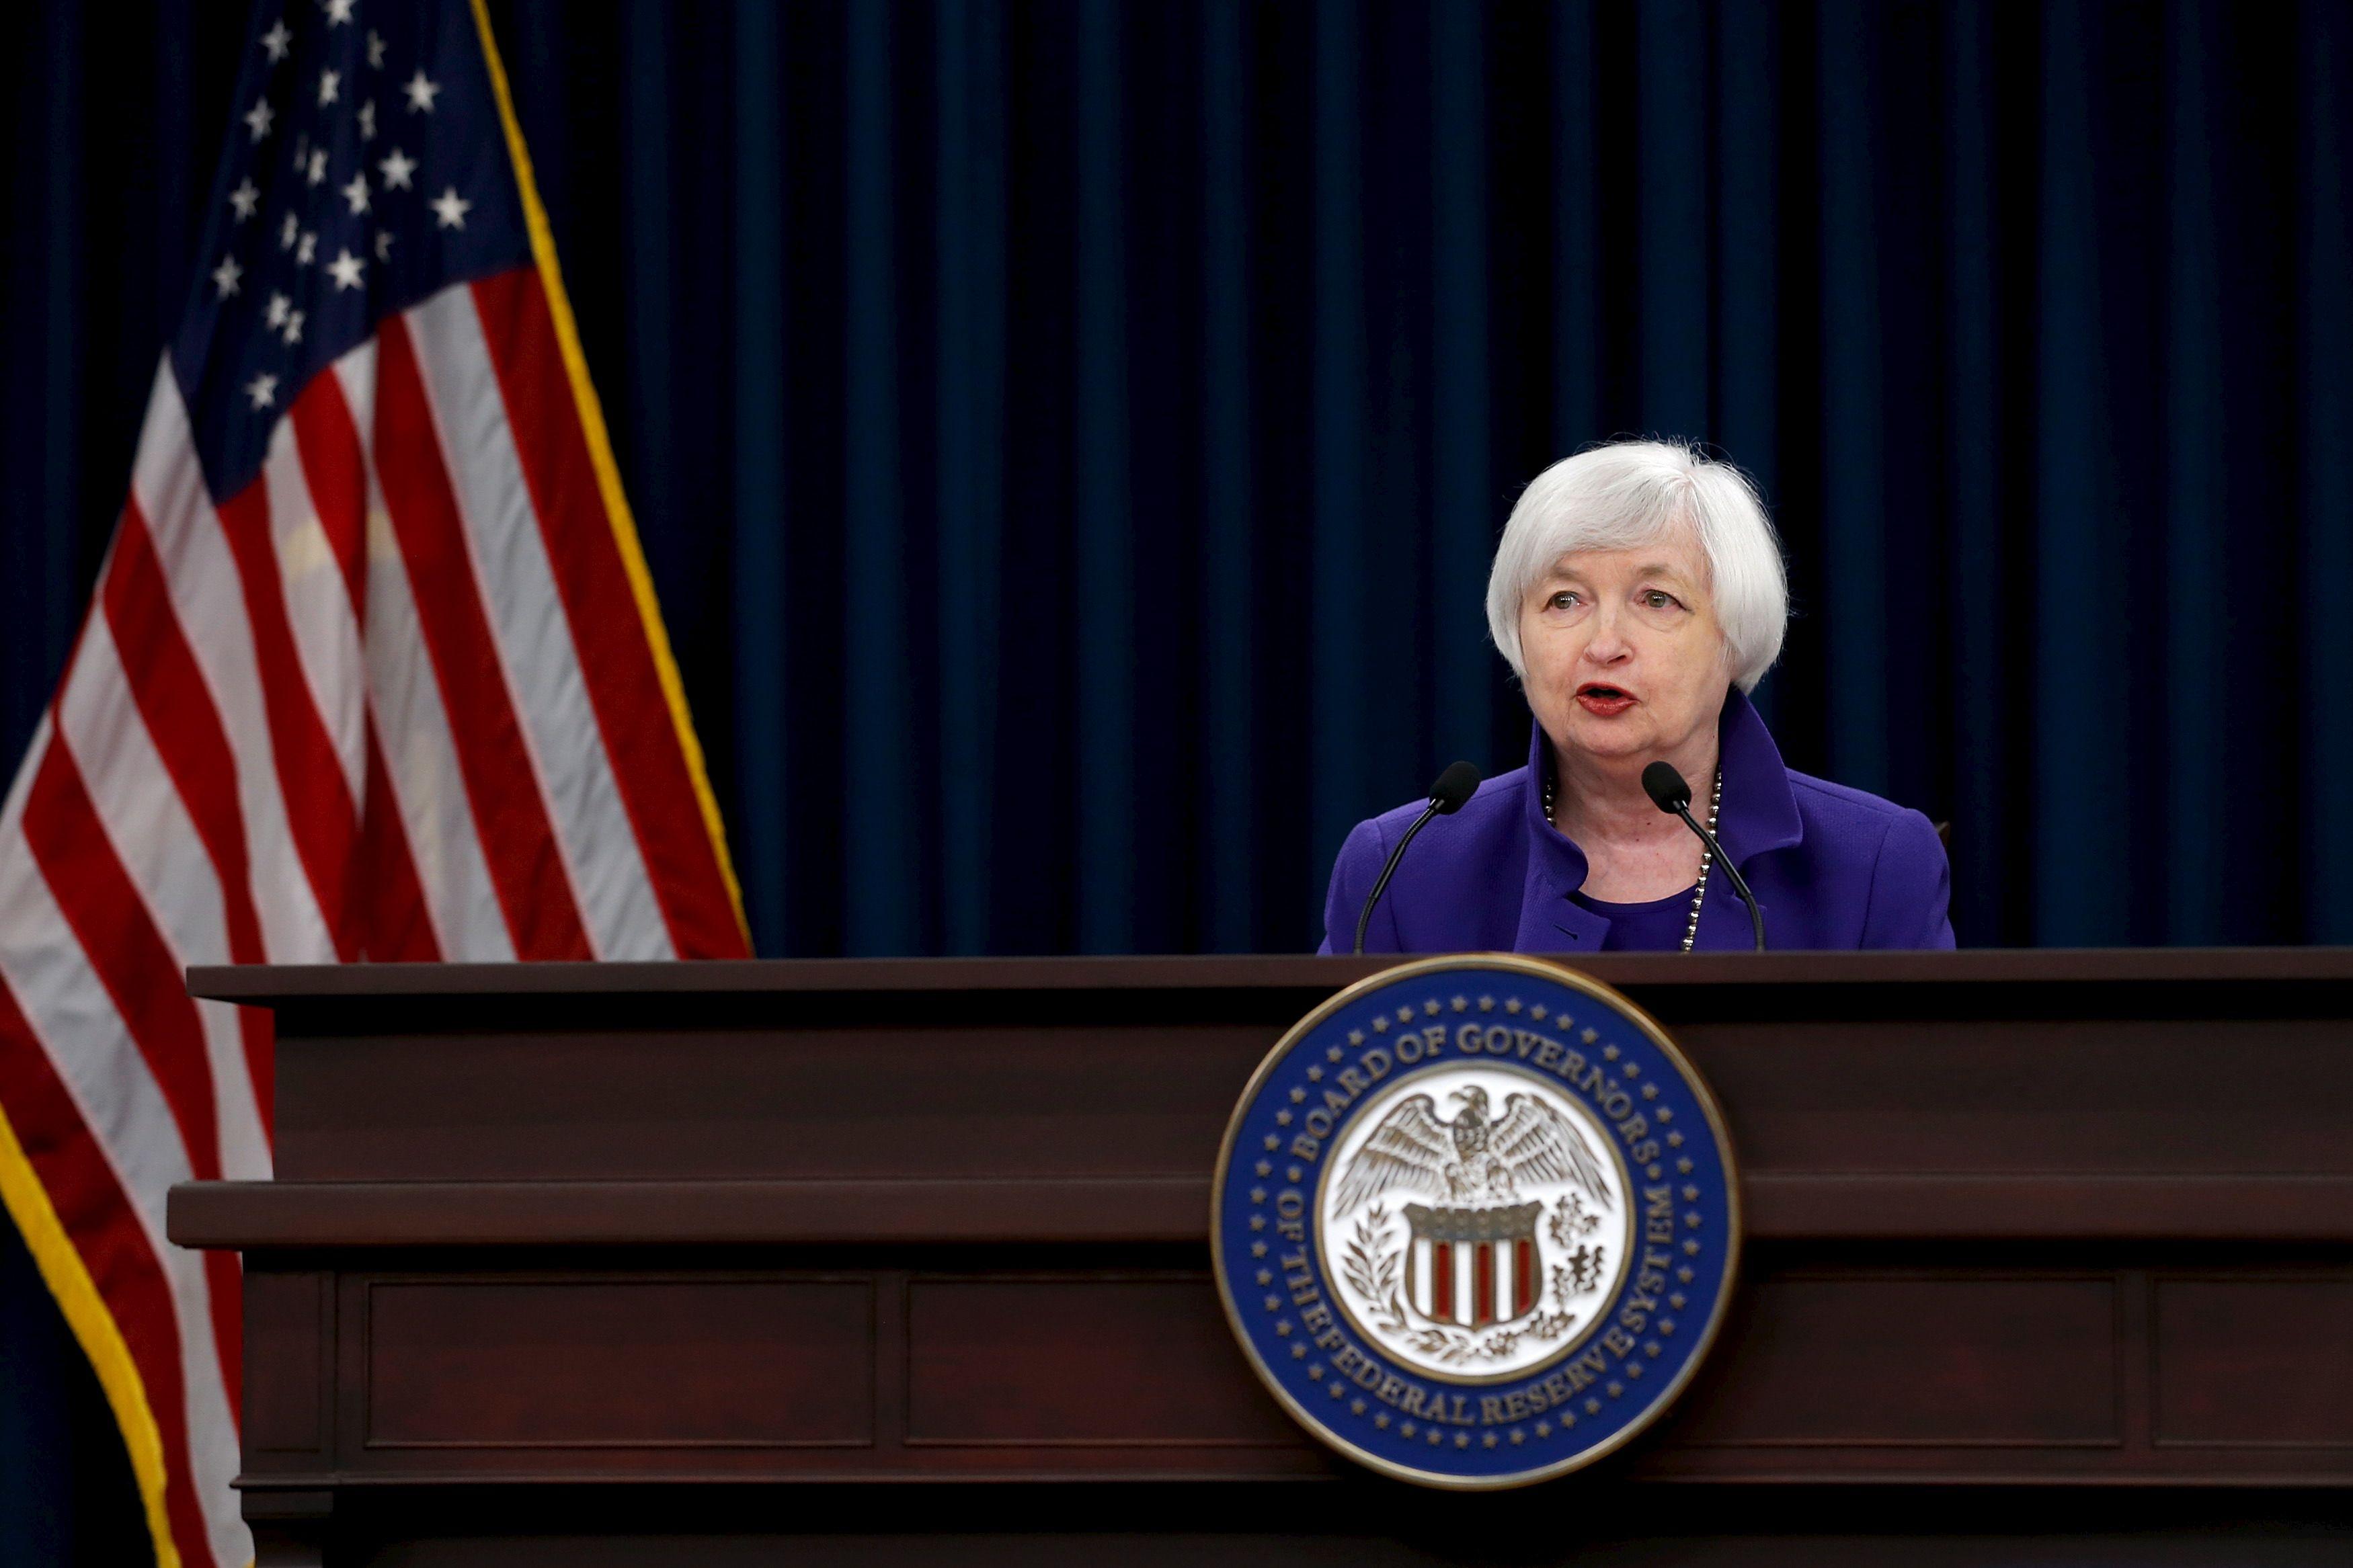 Yellen: s�lygos suprast�jo, bet pal�kanos kils